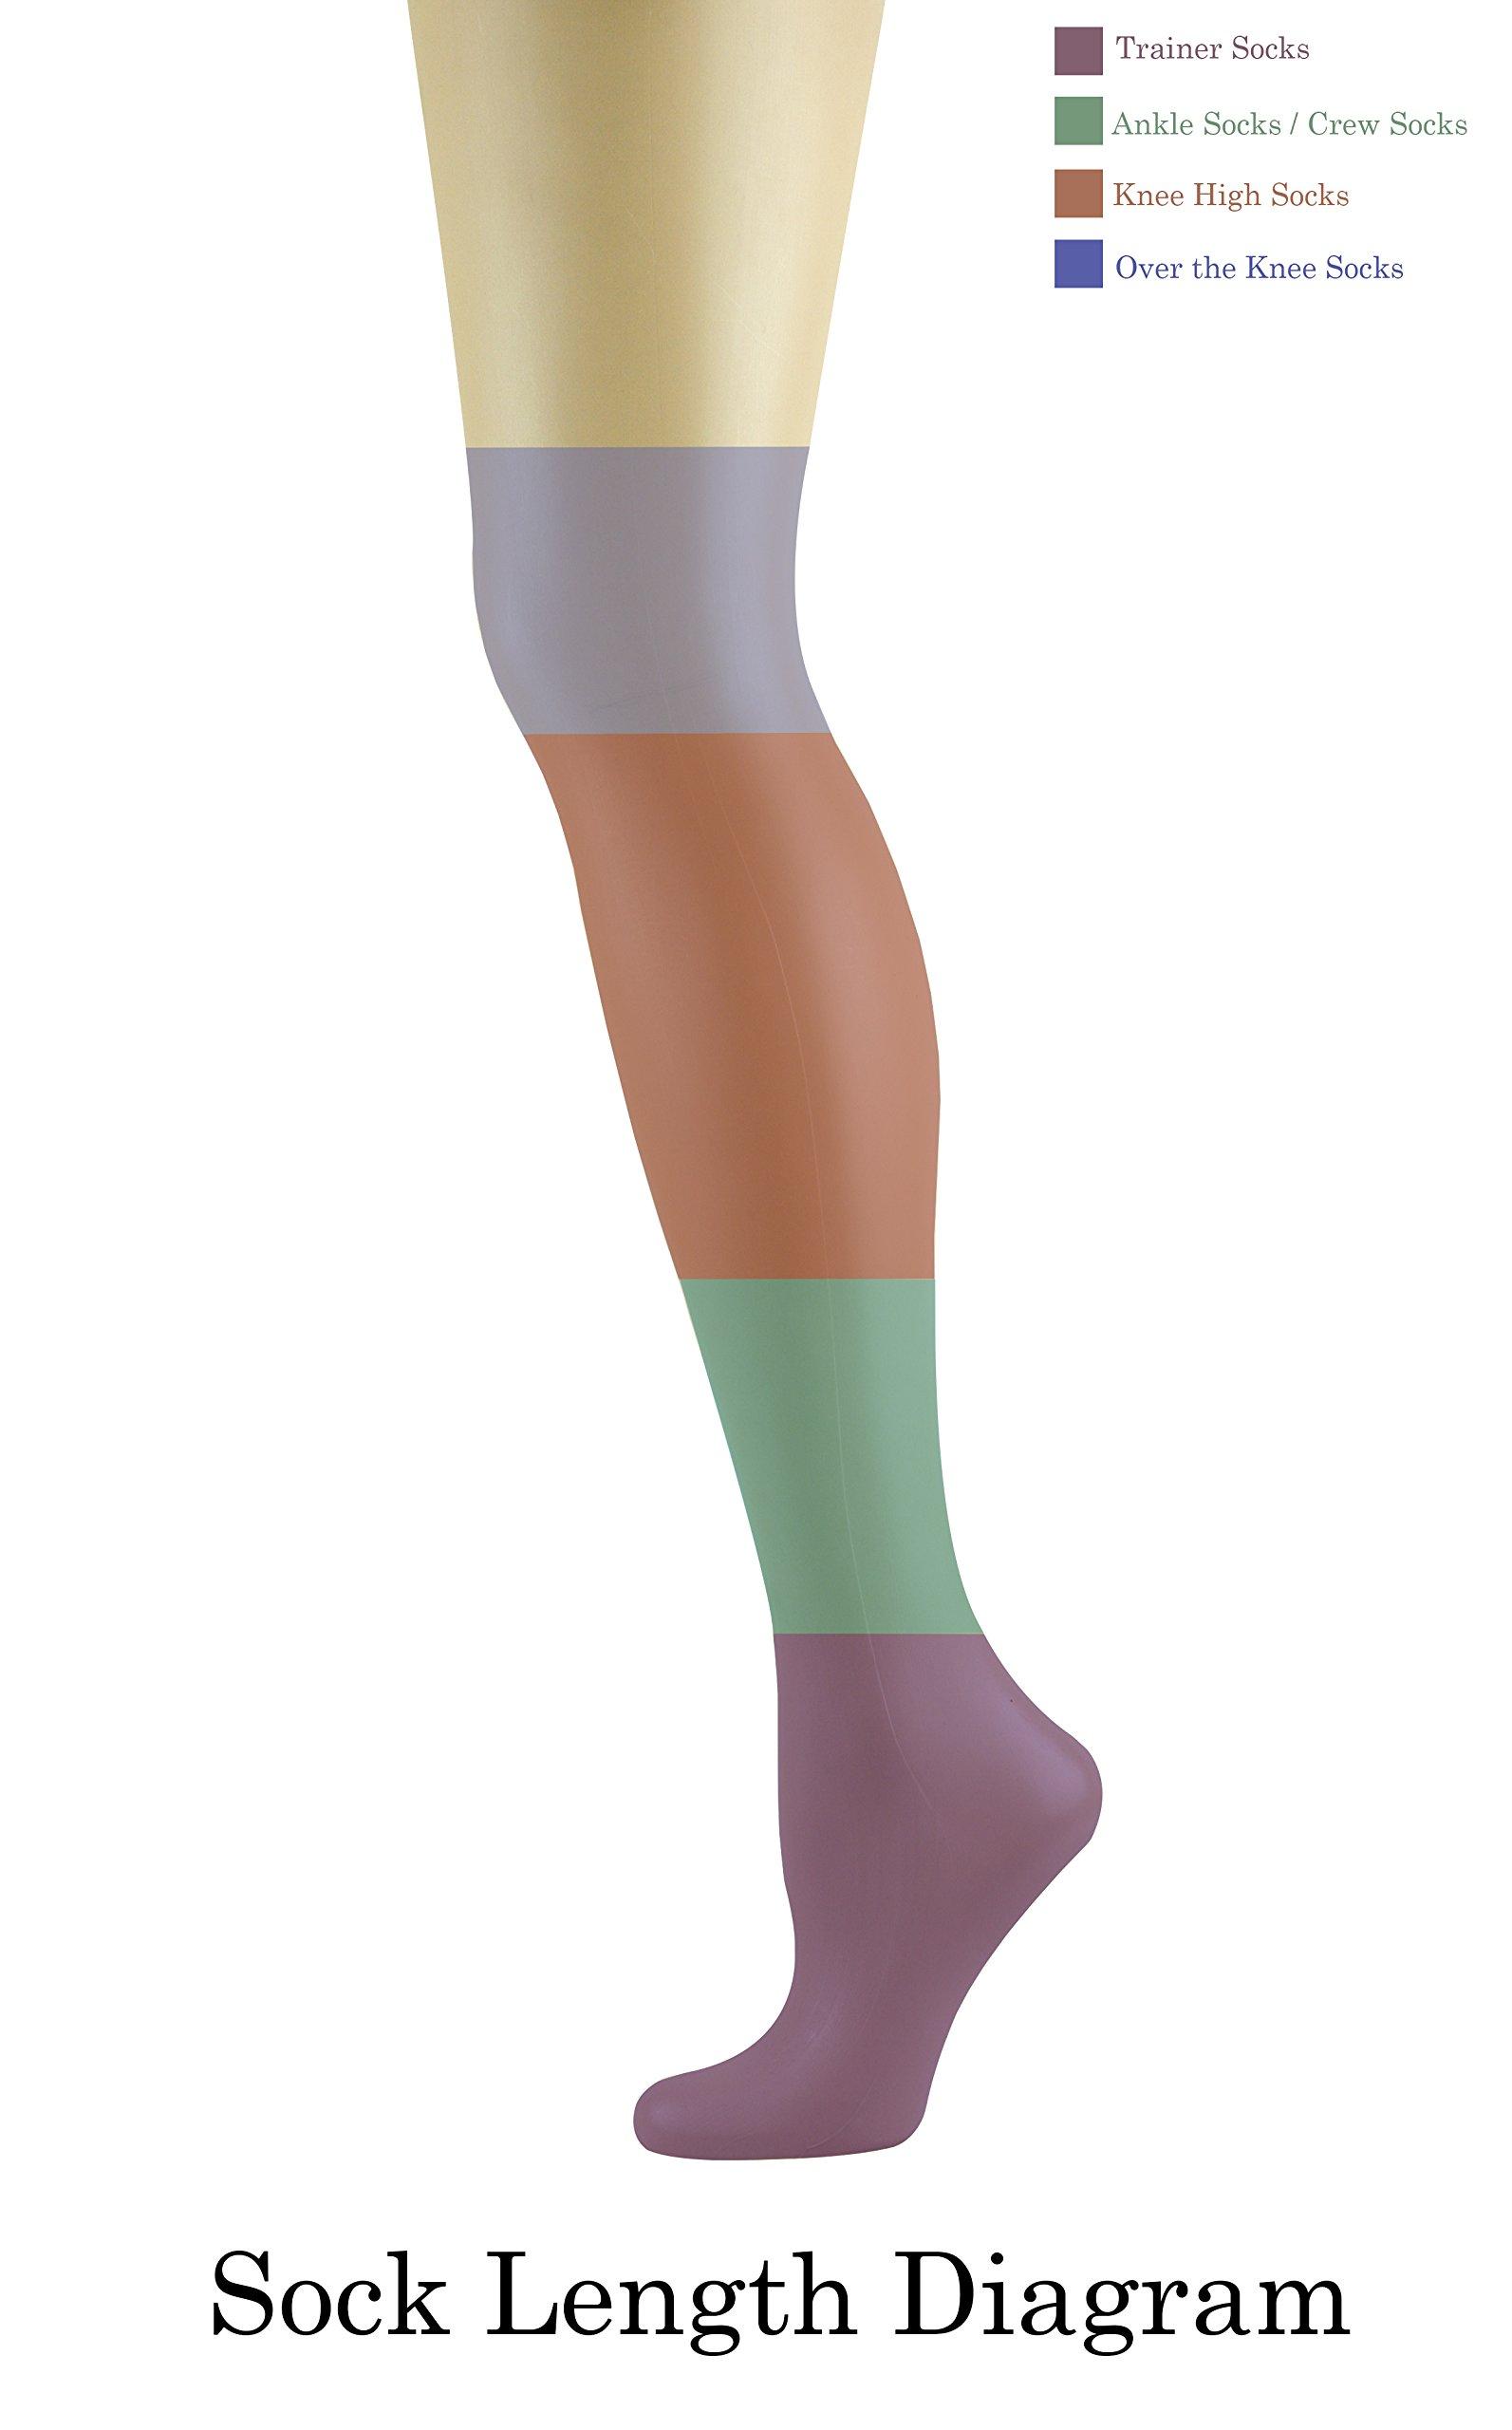 Mysocks Unisex Knee High Long Socks Orange,4-7 by MySocks (Image #2)